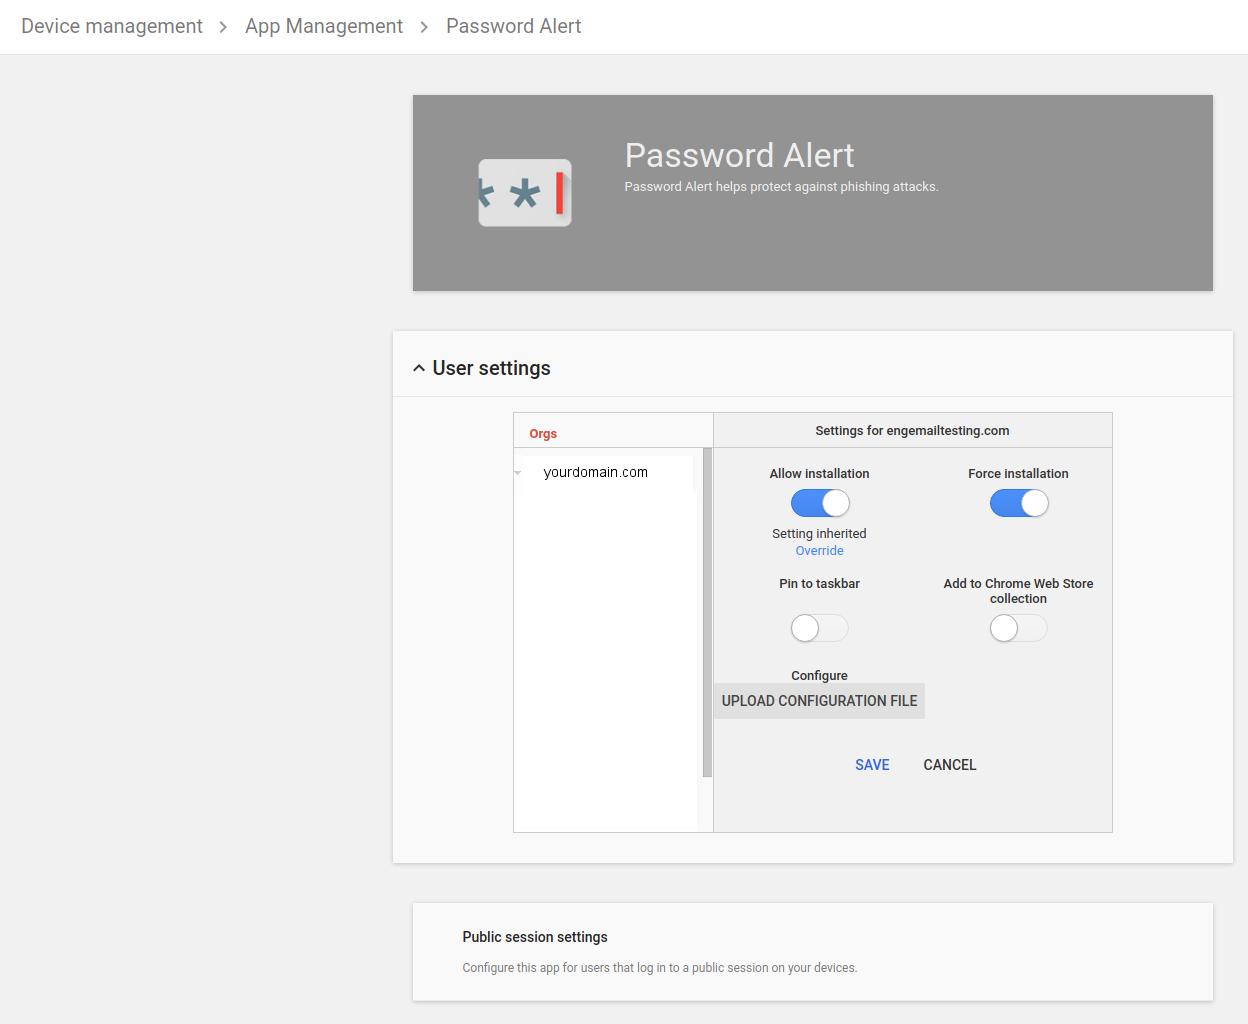 G Suite Updates Blog: 7 ways admins can help secure accounts against